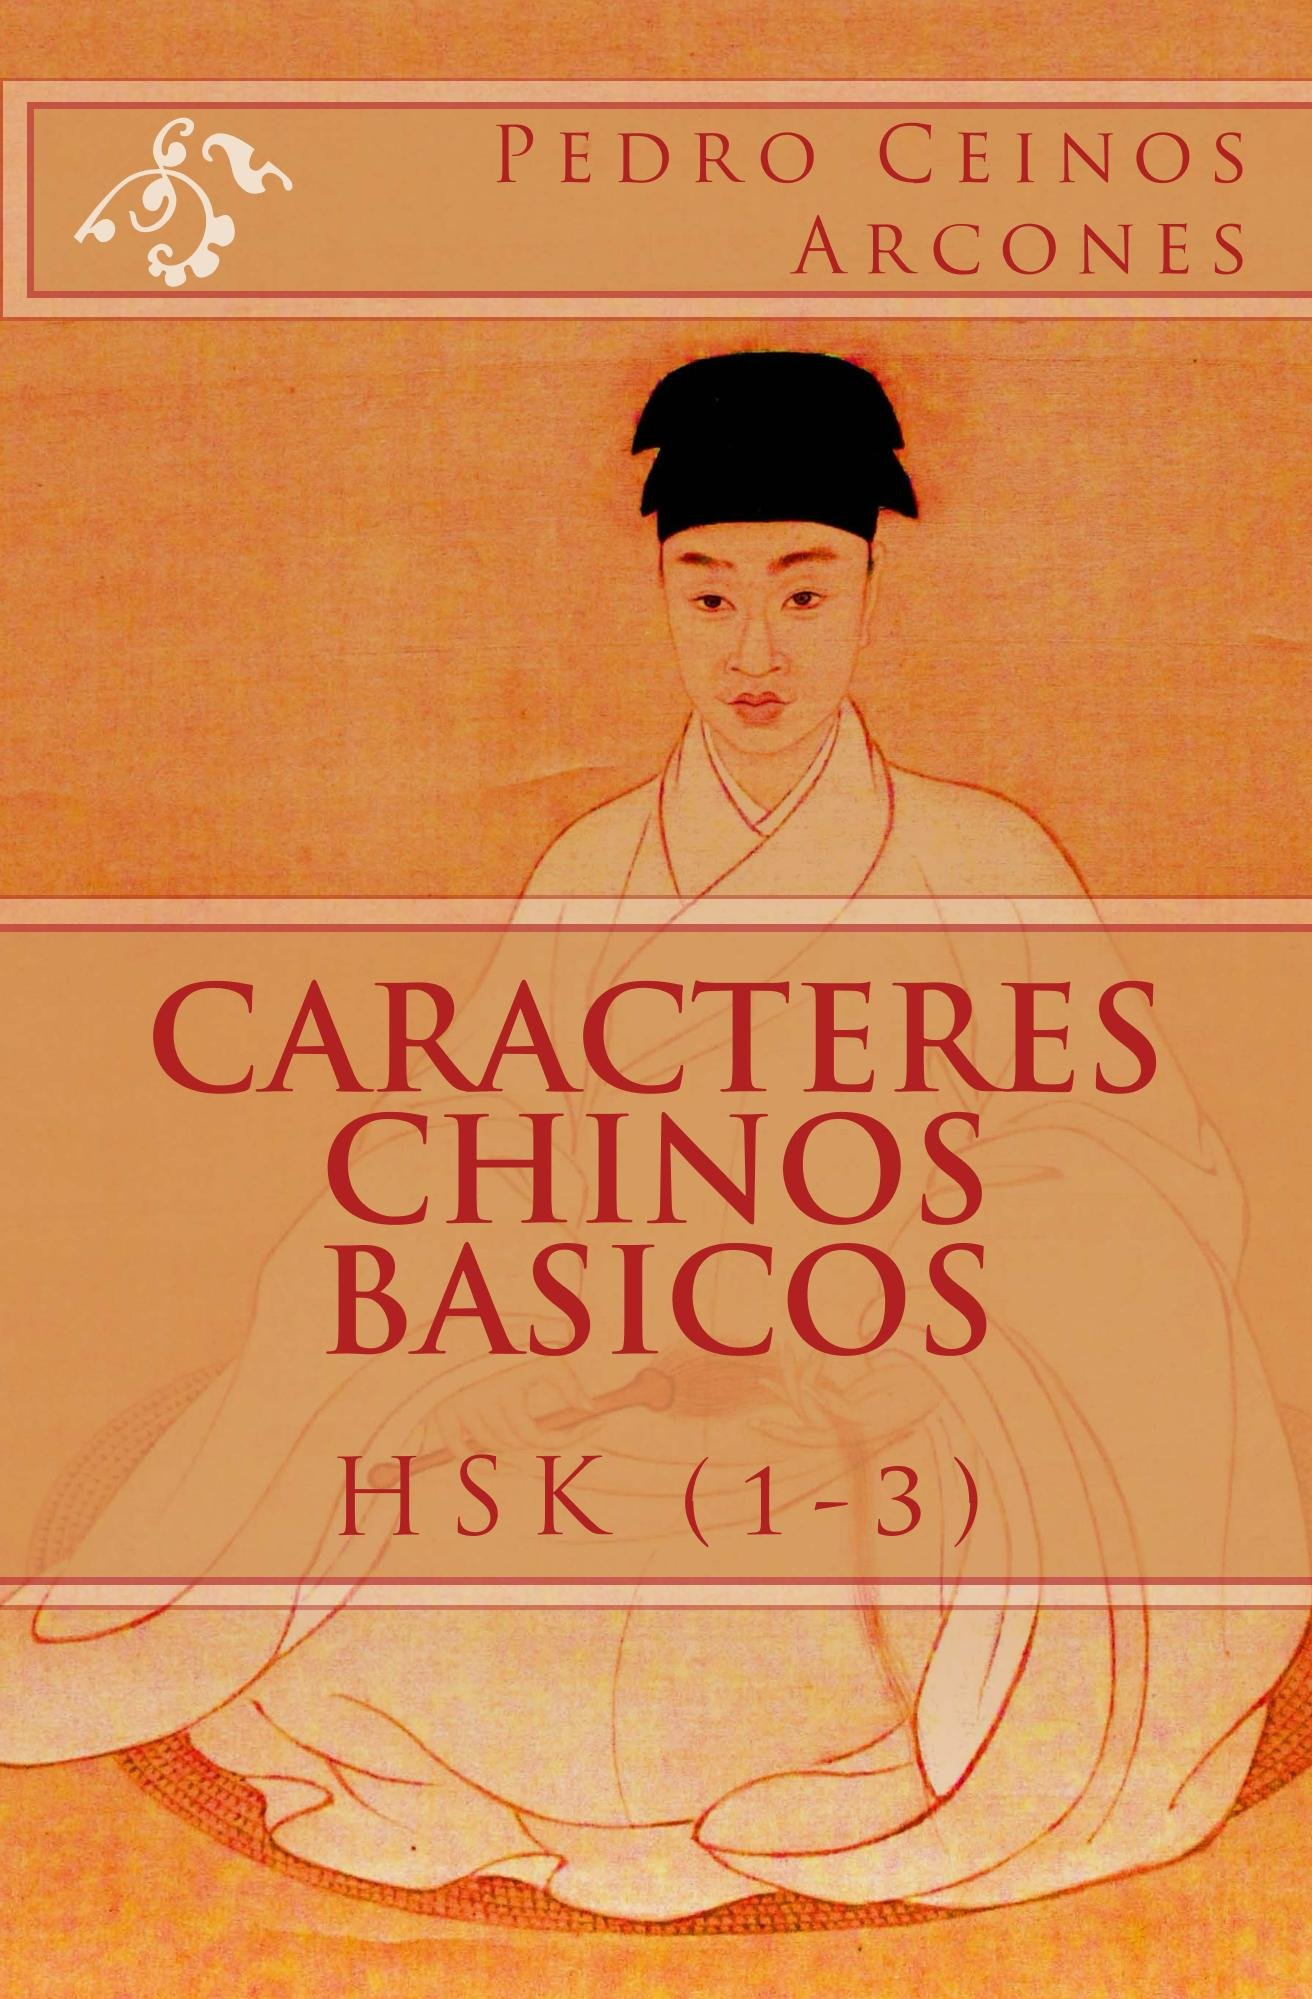 Caracteres Chinos Basicos HSK (1-3)